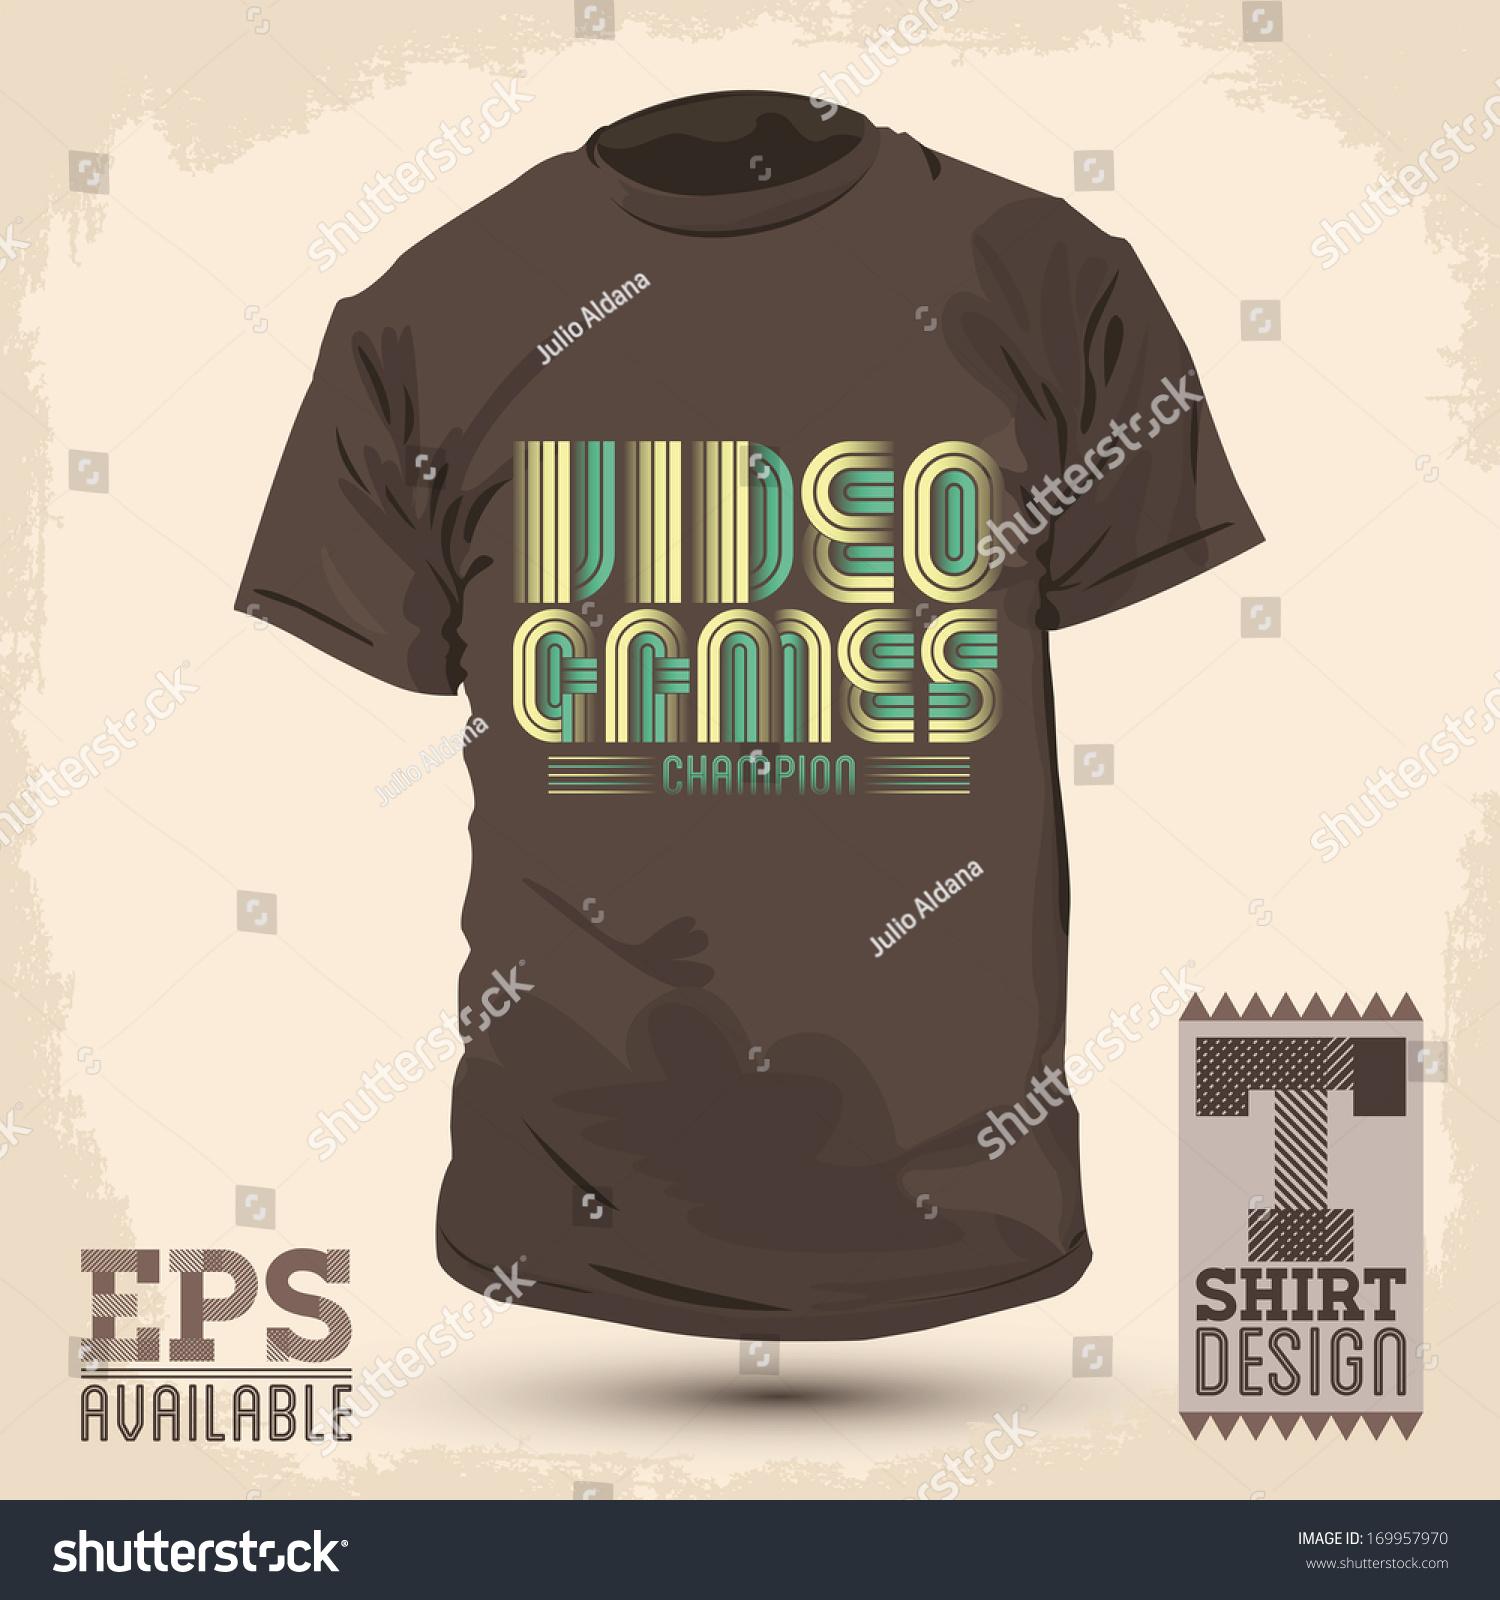 Shirt design video - Save To A Lightbox